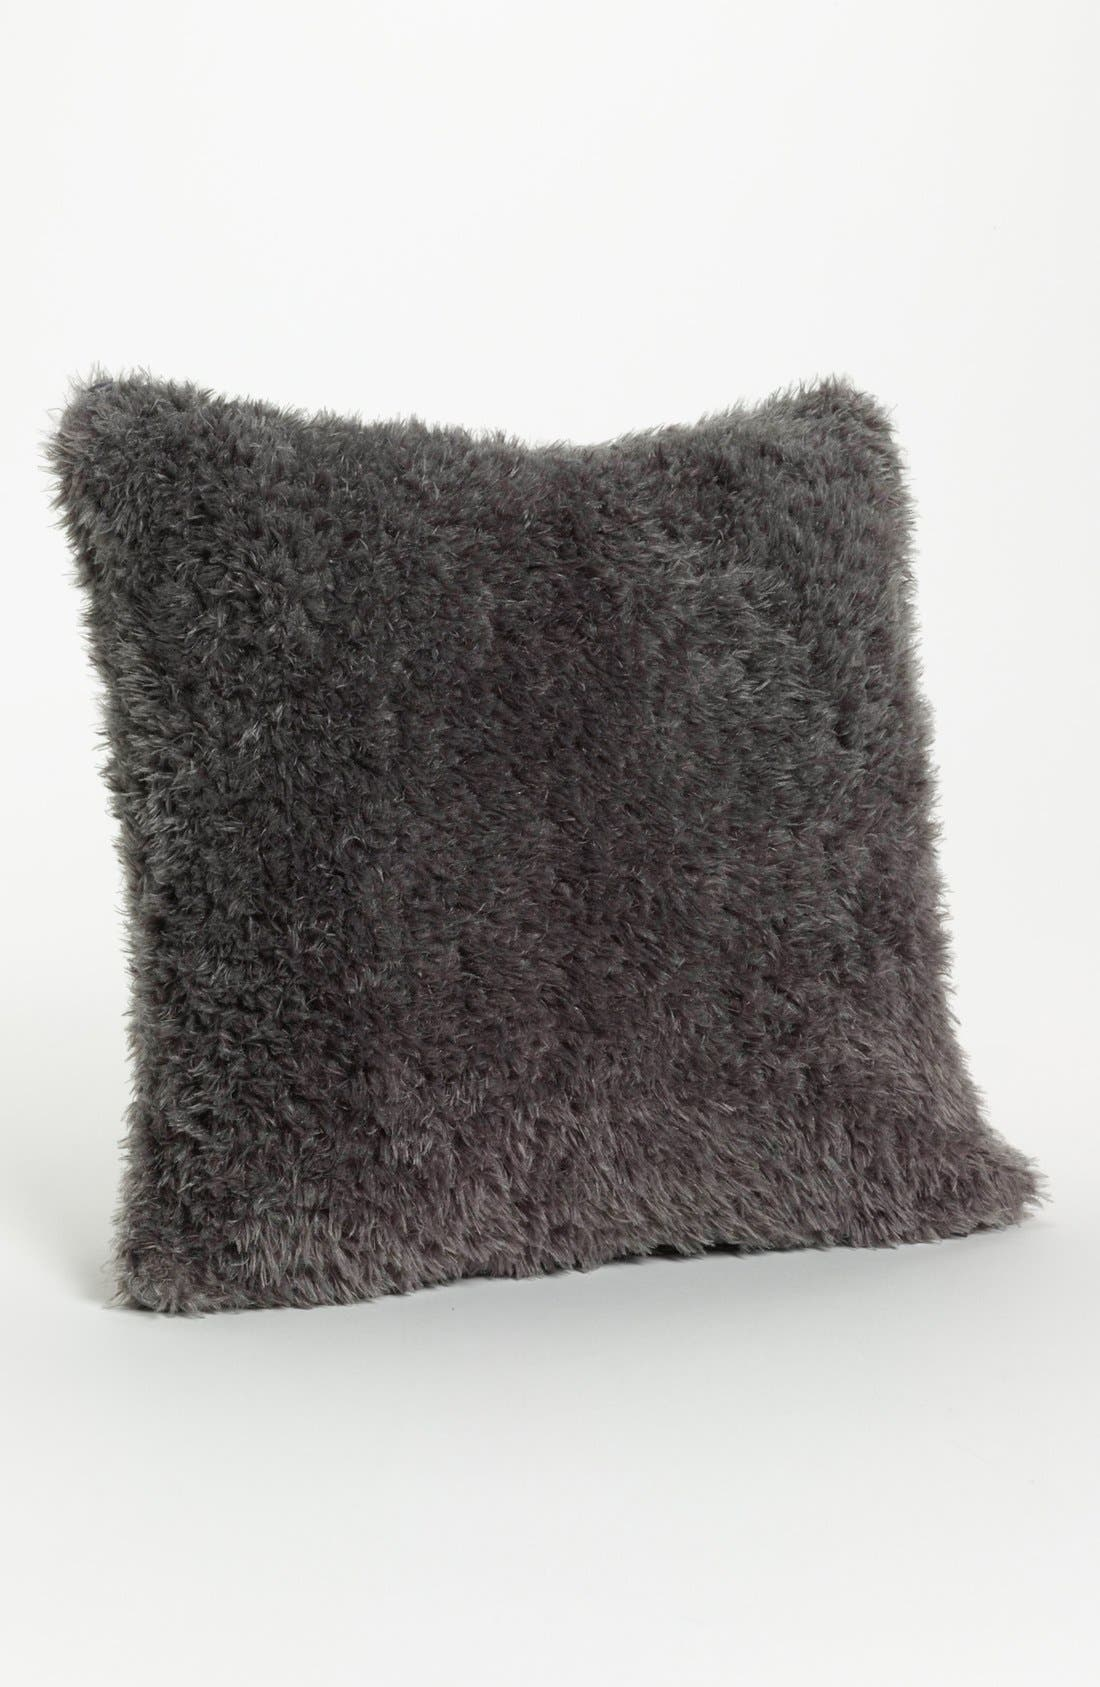 'Bella' Throw Pillow,                         Main,                         color, Charcoal